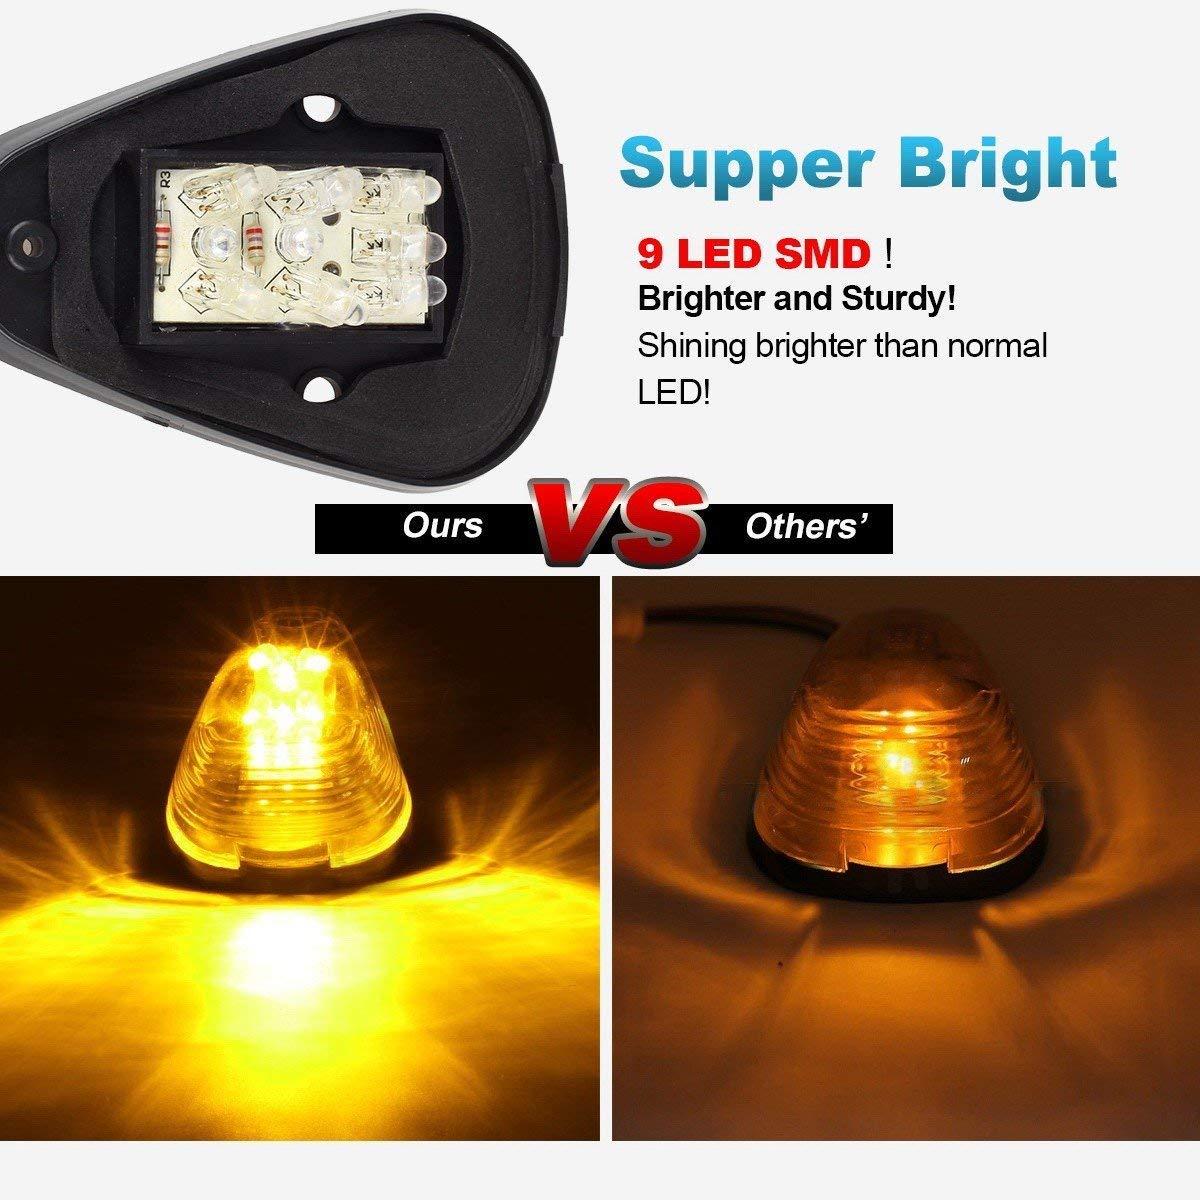 5x Ice Blue 5050-SMD 194 168 T10 LED Bulb for 1999-2016 E150 E250 E350 E350 Super Duty E450 Super Duty F250 F350 F450 F550 Super Duty F150 5x Smoke Cab Marker Clearance Light